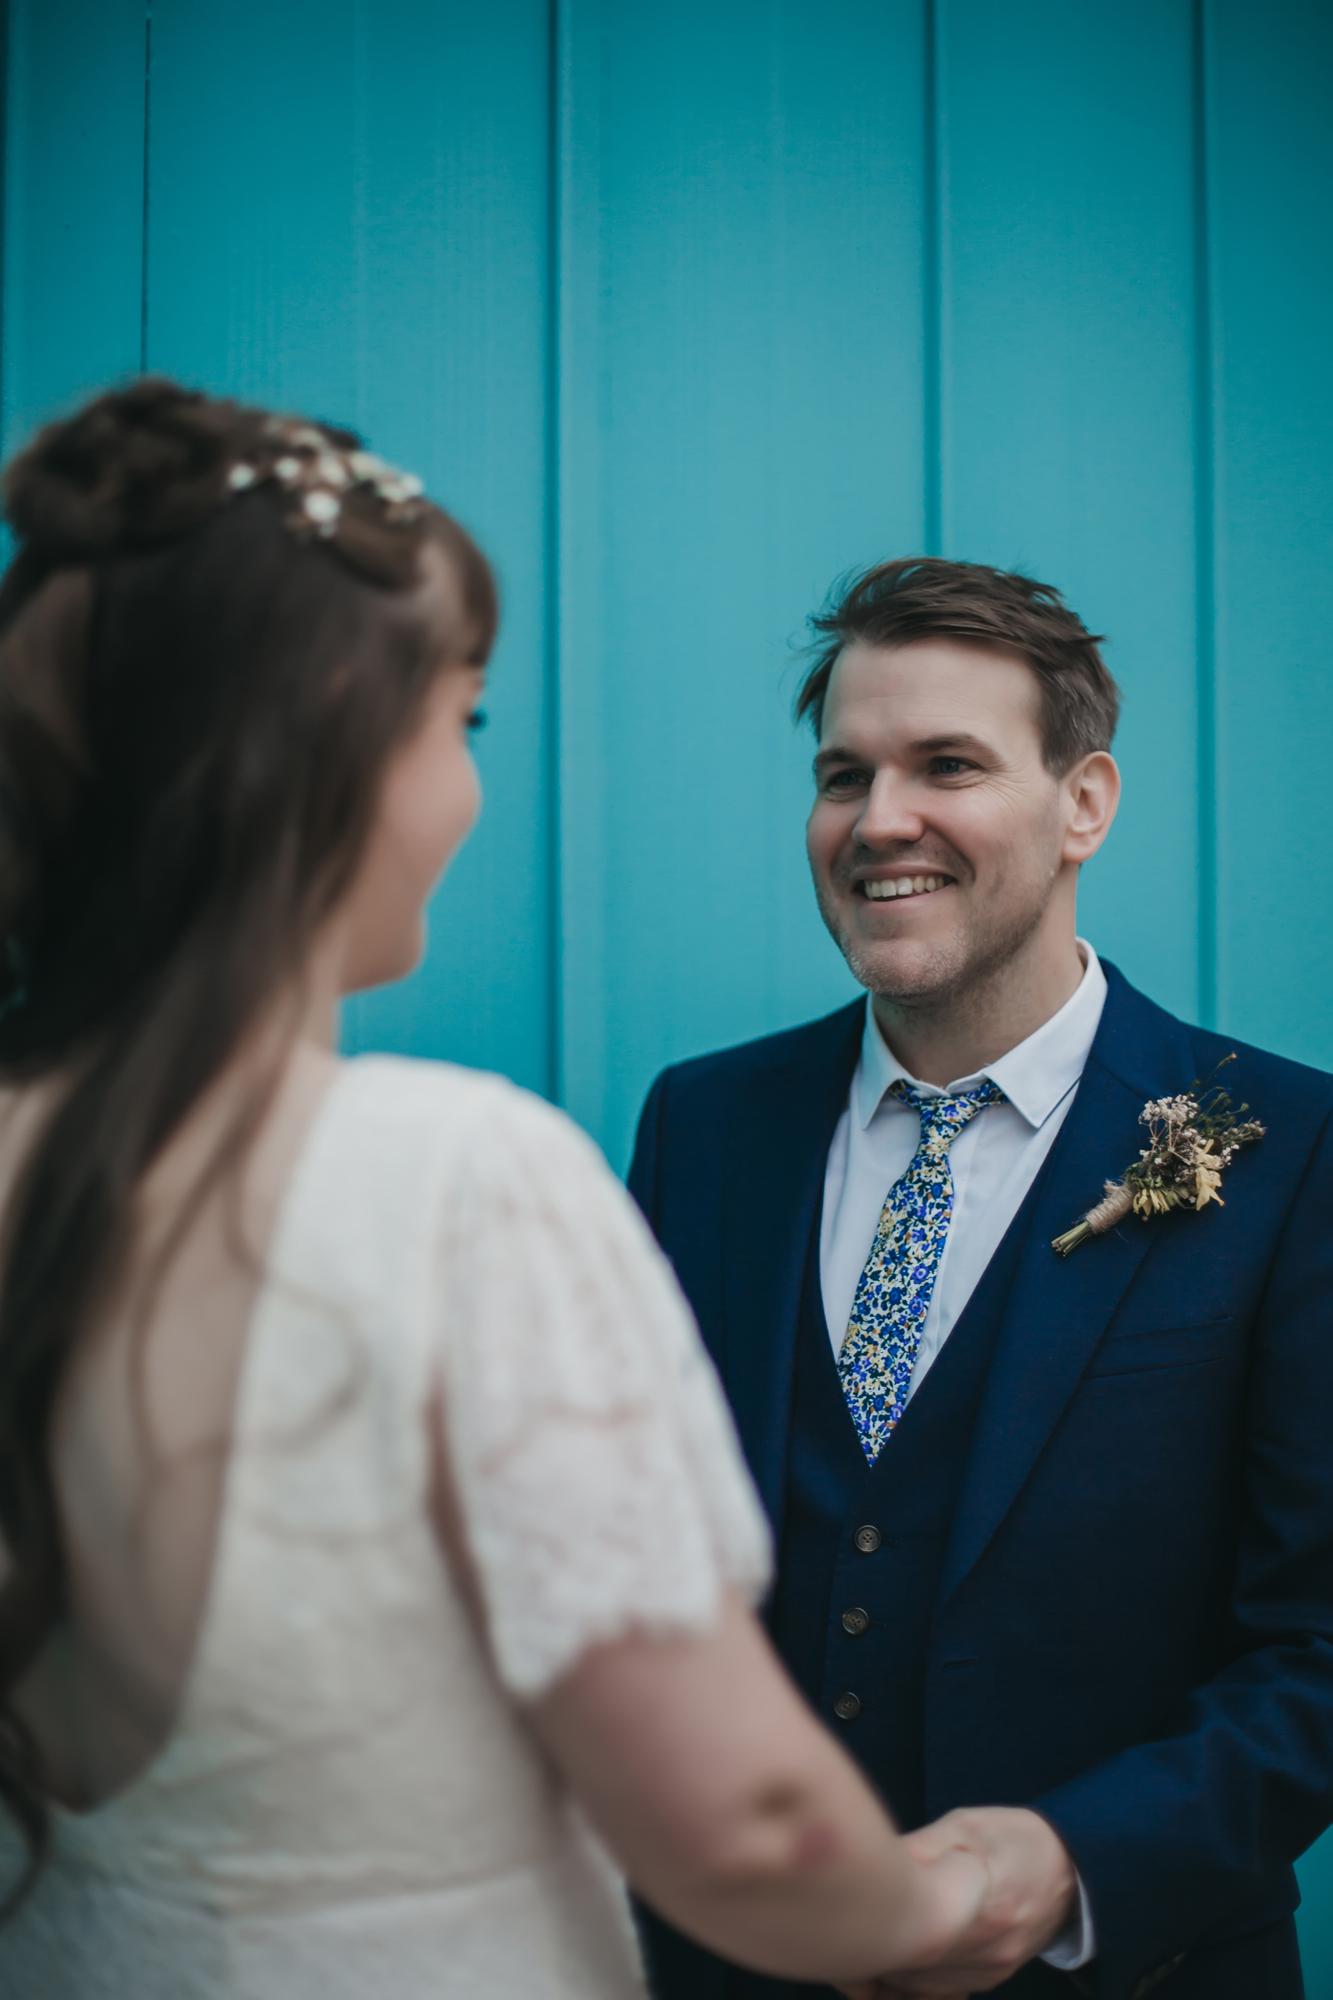 Kristy-Back-Garden-Outdoor-Wedding-Sheffield-Industrial-Warehouse-Wedding-Bohemian-Kate-Beaumont-Dahlia-Dress-45.jpg